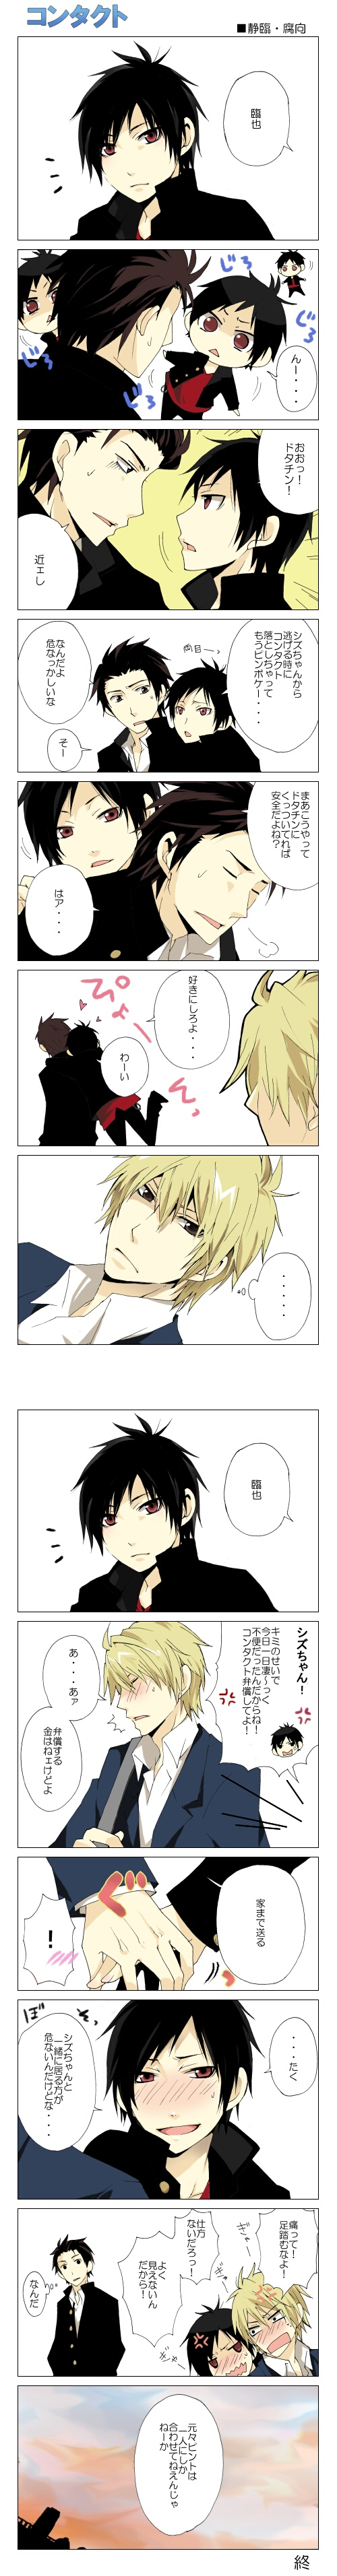 Tags: Anime, DURARARA!!, Orihara Izaya, Heiwajima Shizuo, Sigh, Translation Request, Comic